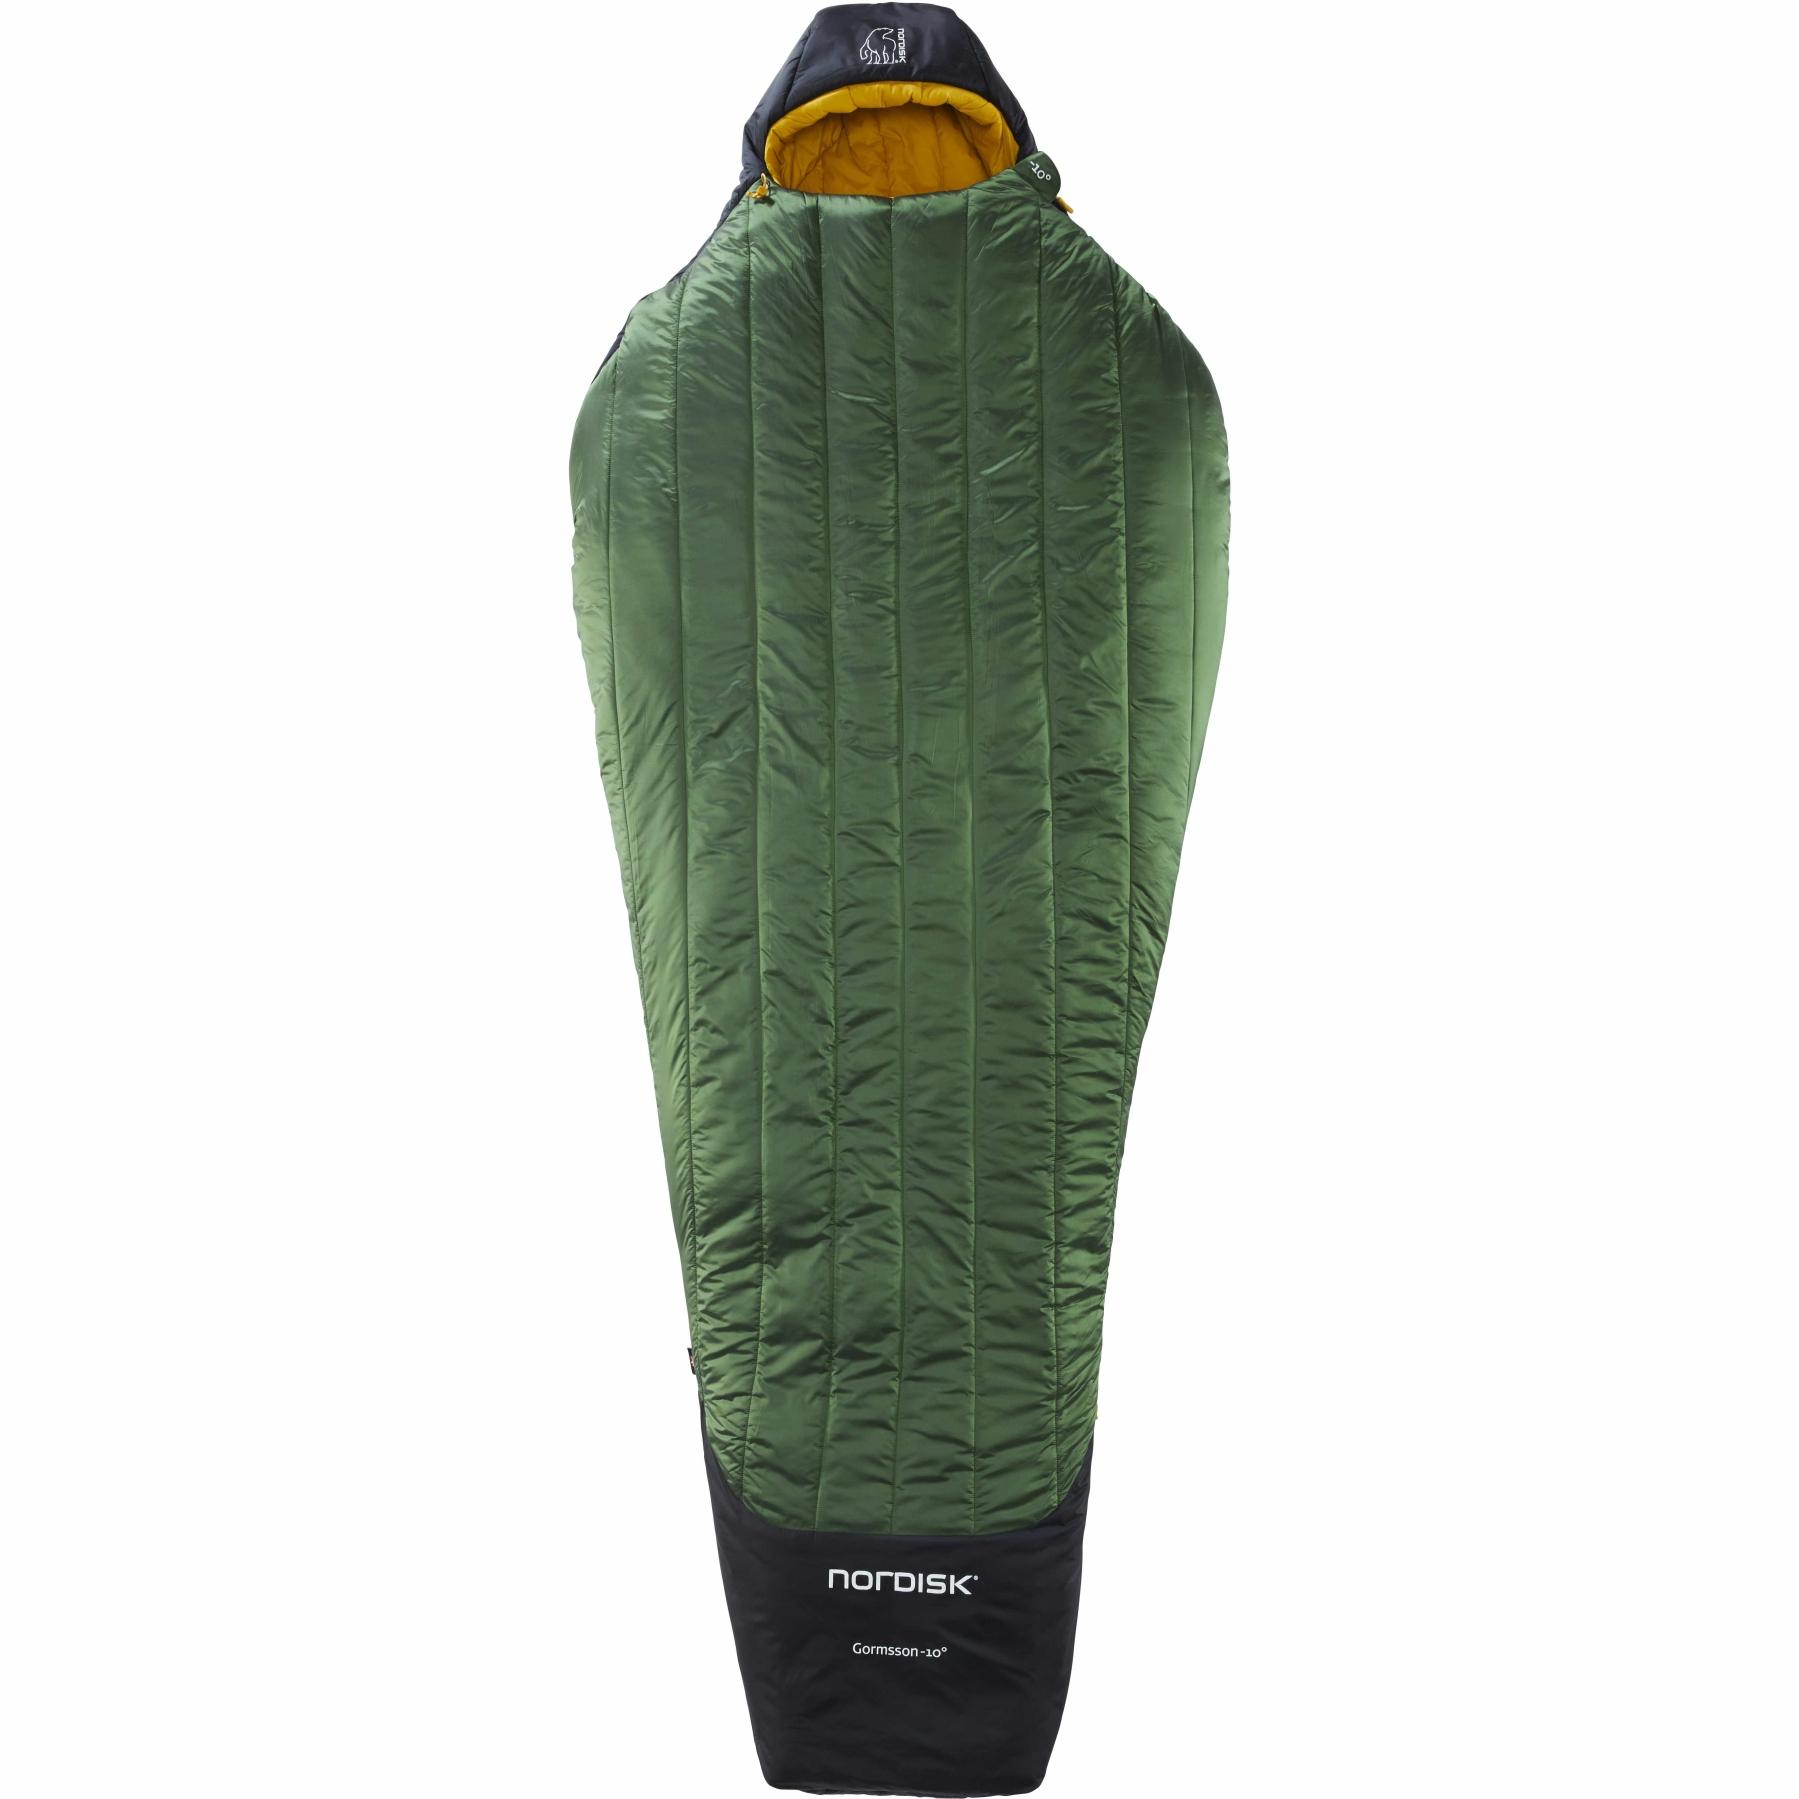 Nordisk Gormsson -10° Mummy Sleeping Bag L - artichoke green/mustard yellow/black